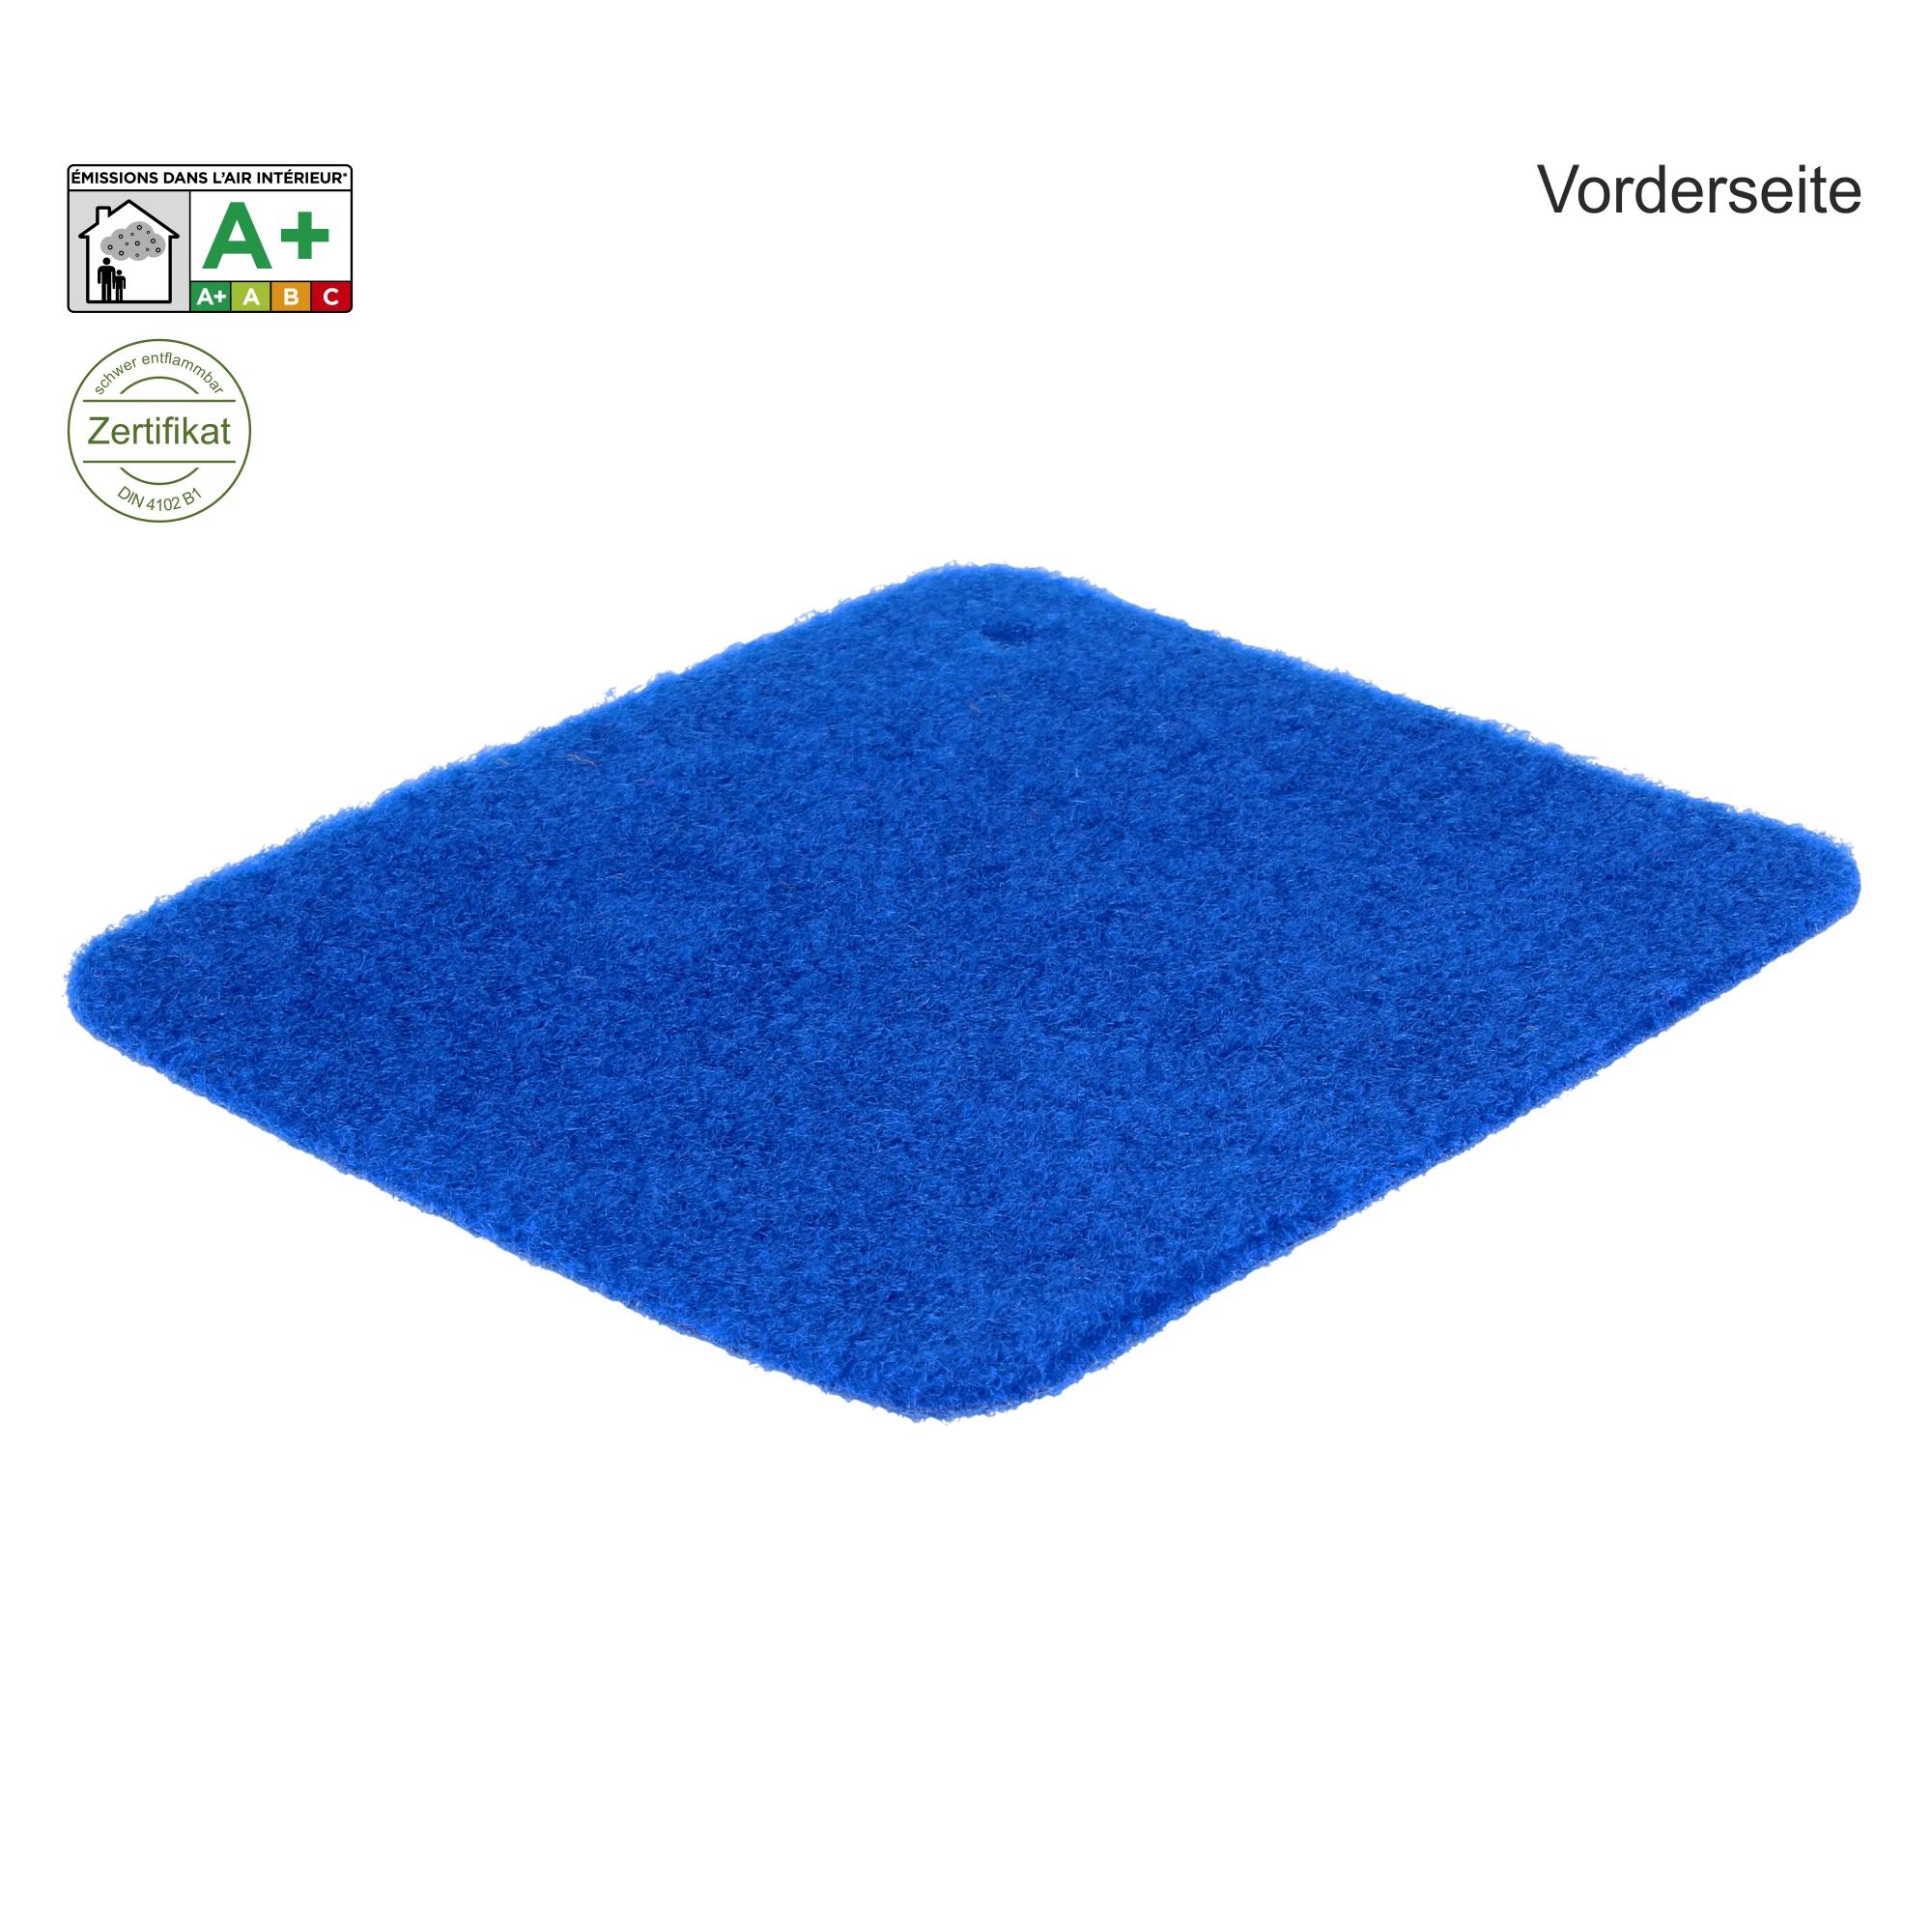 velours messeteppich b1 exposhow blau velours b1. Black Bedroom Furniture Sets. Home Design Ideas